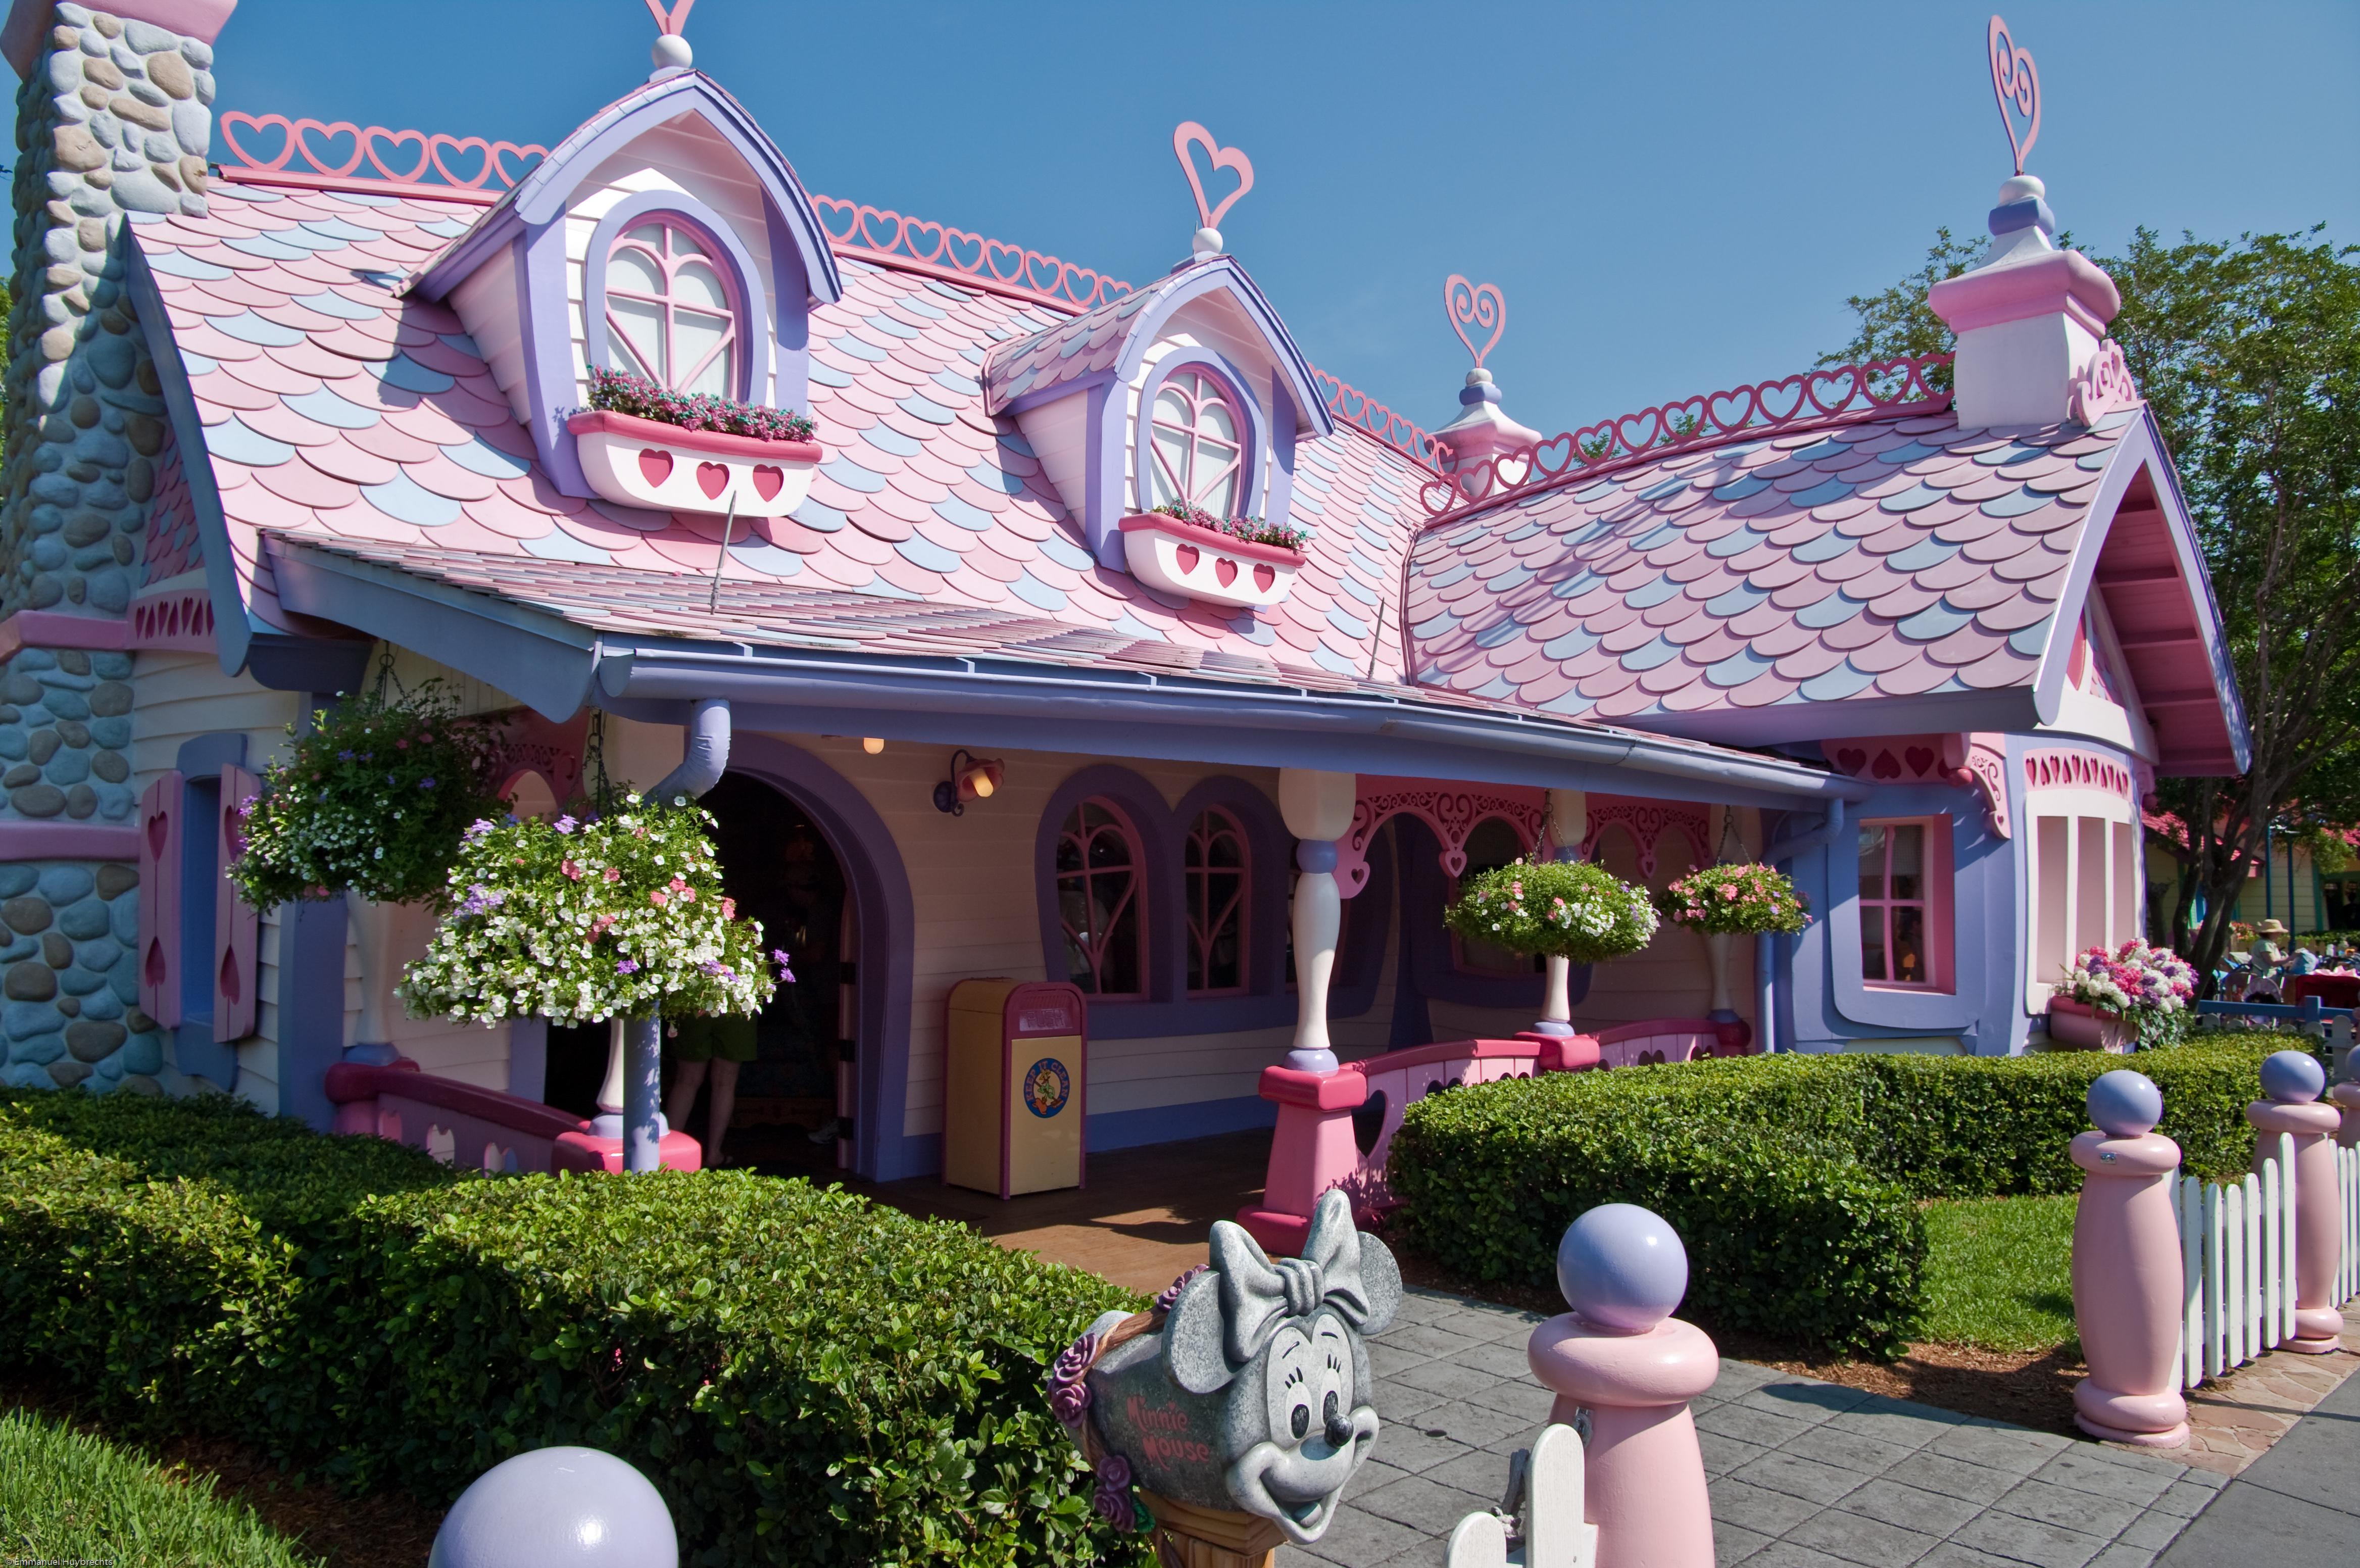 File:Minnies Country House (3680532700).jpg - Wikimedia ...